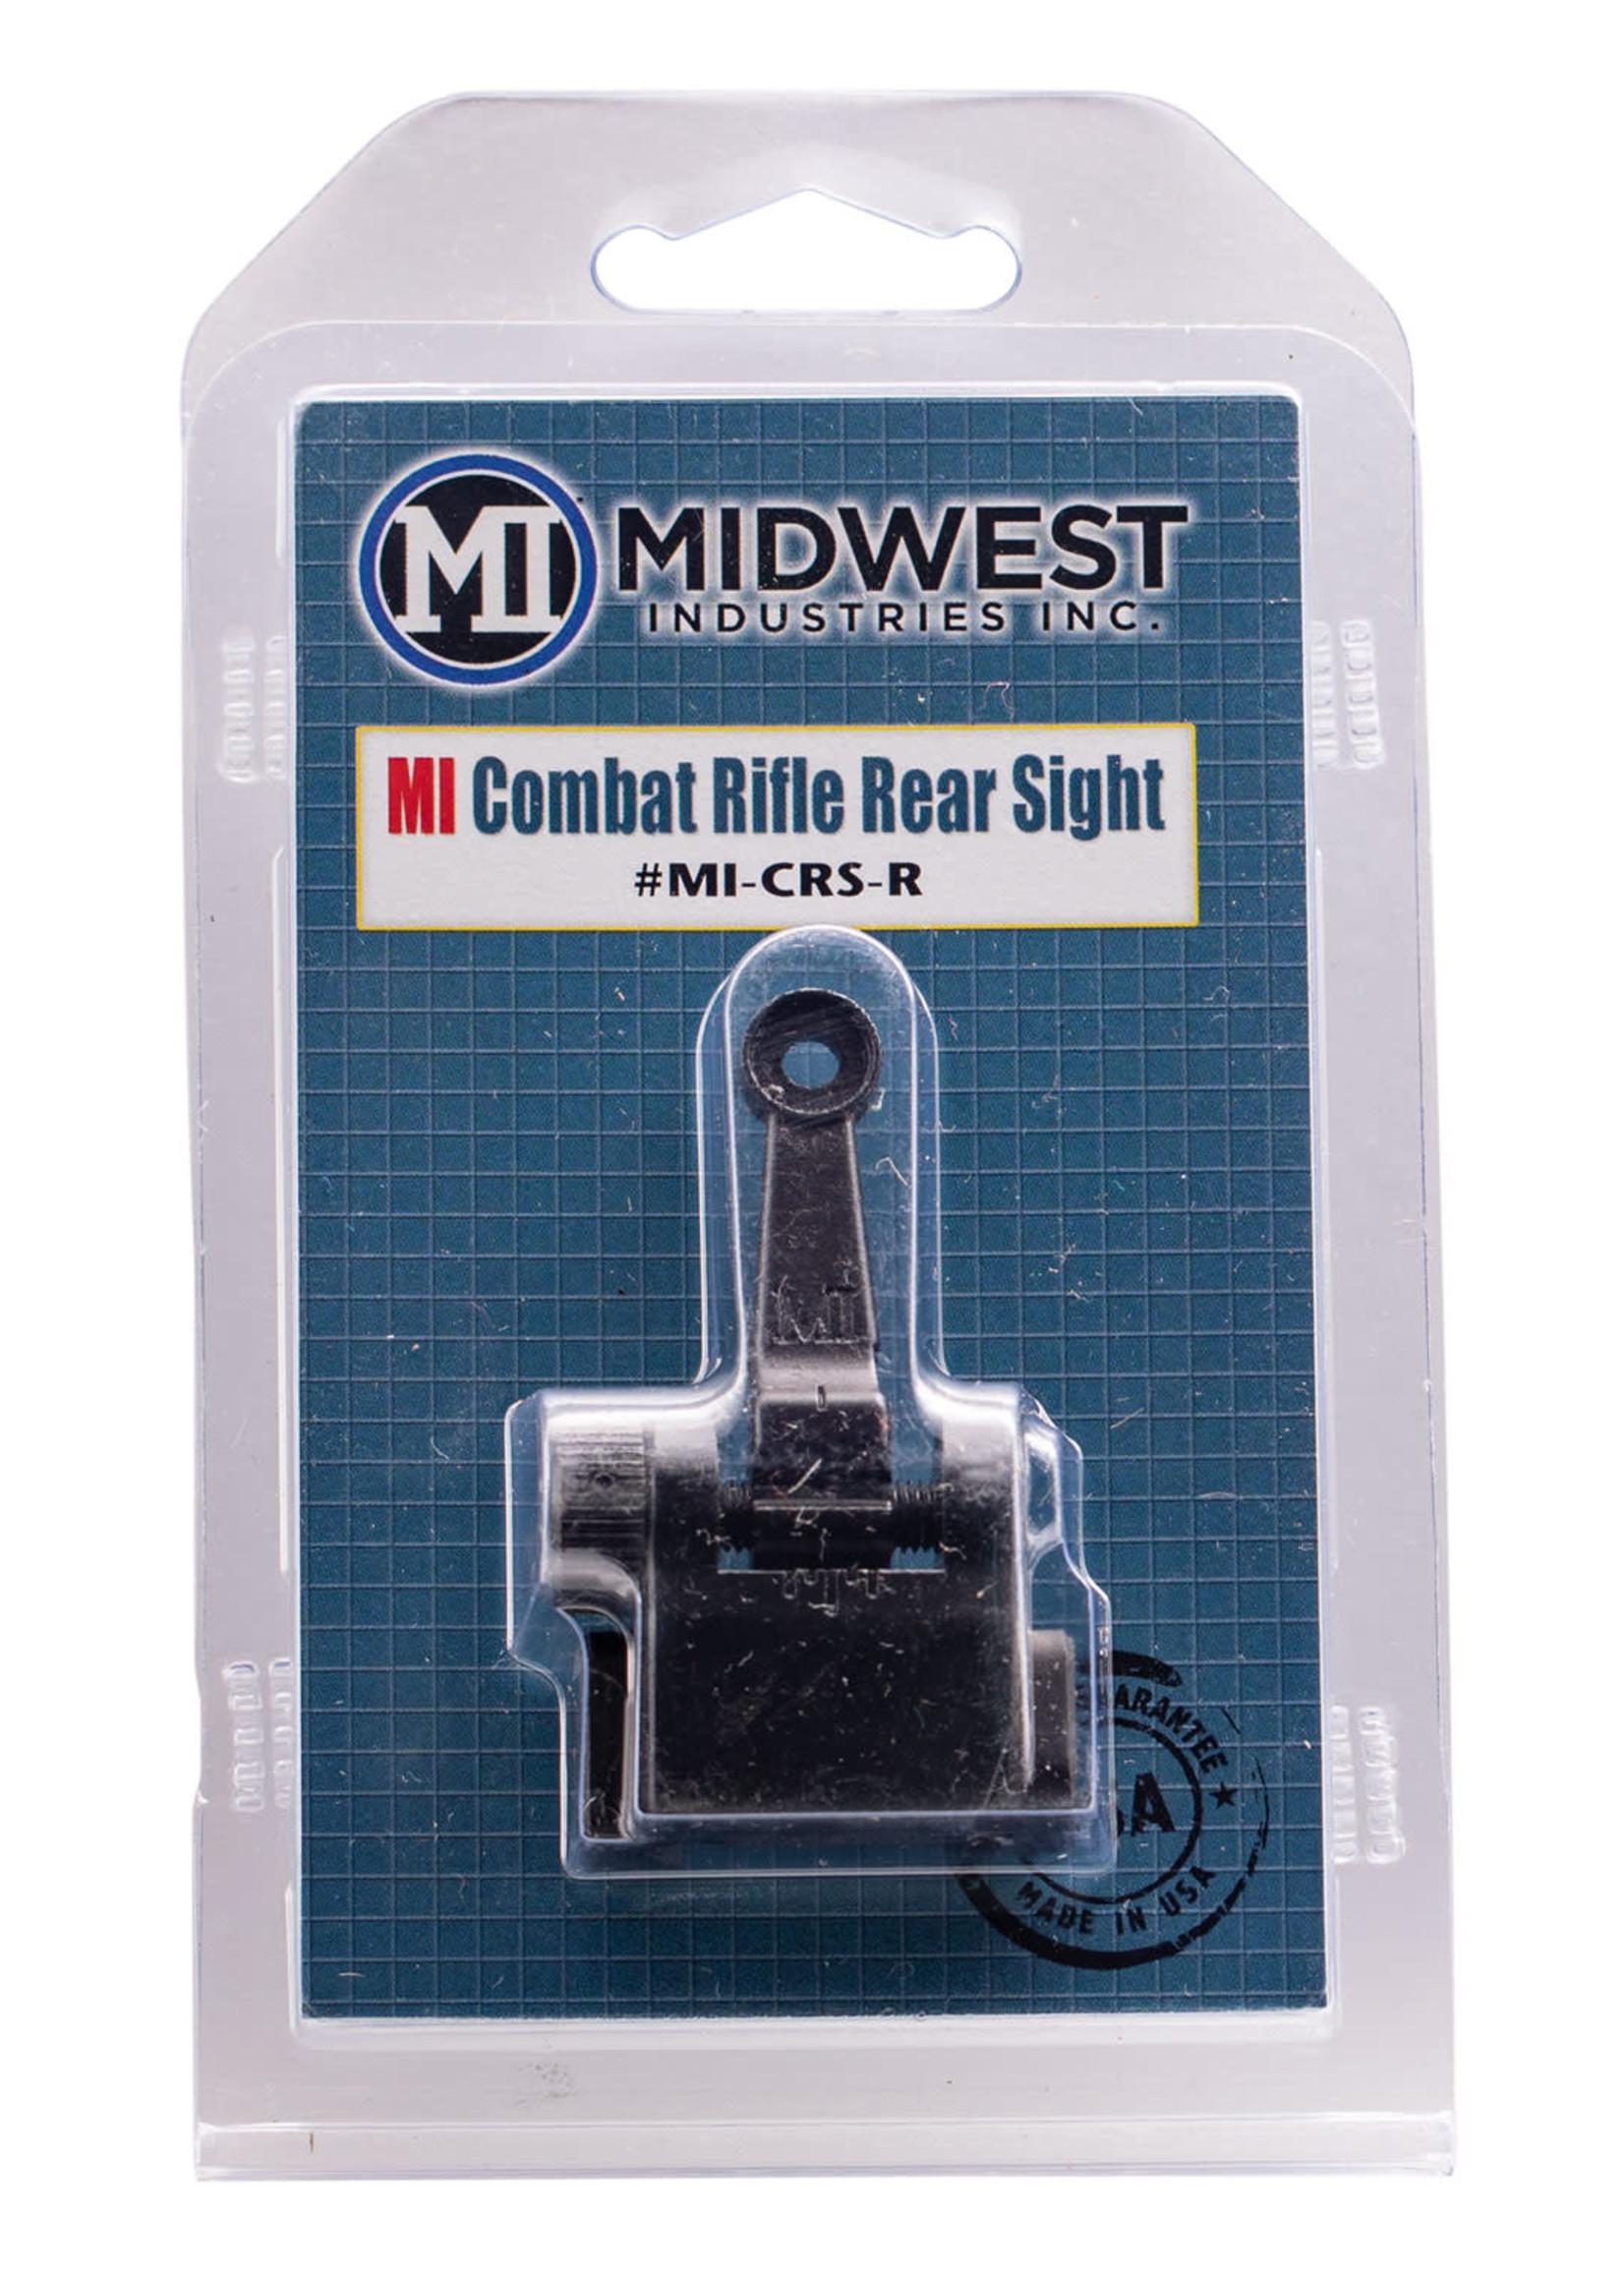 Midwest Industries Midwest Industries Combat Rifle Rear Sight AR-15, M4, M16 Black Hardcoat Anodized Flip Up Steel/Aluminum